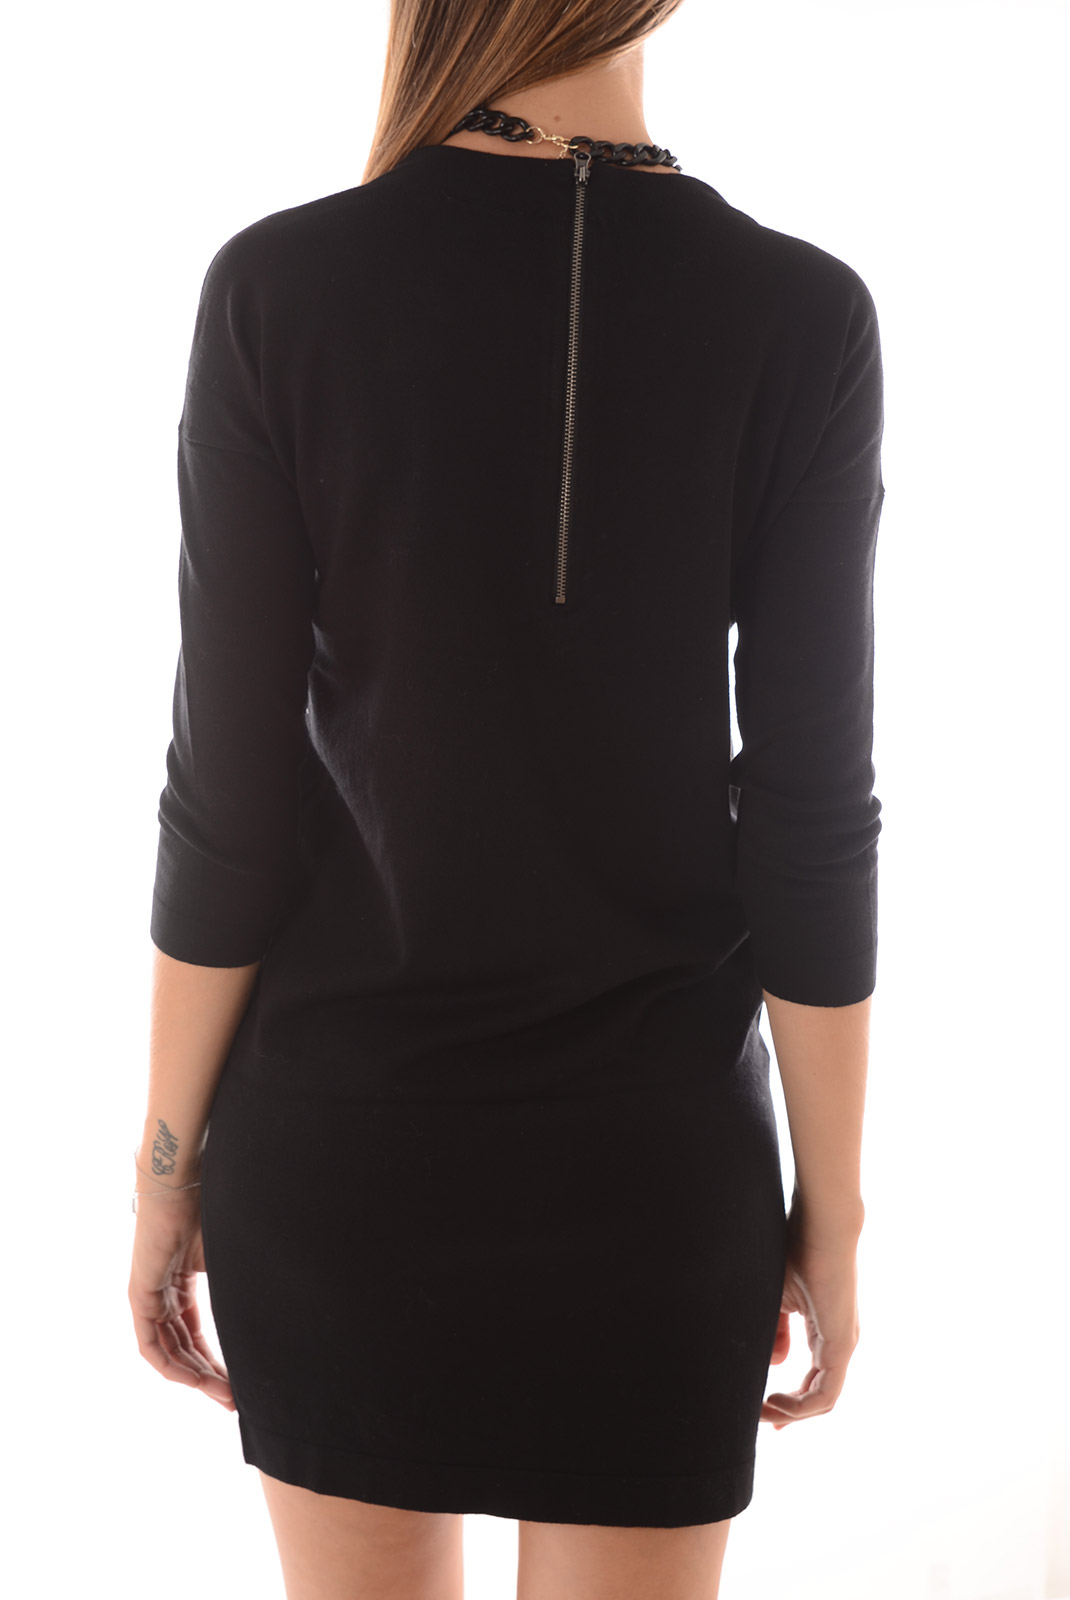 Robes  Vero moda GLORY VIPE AURA 3/4 DRESS NOOS BLACK